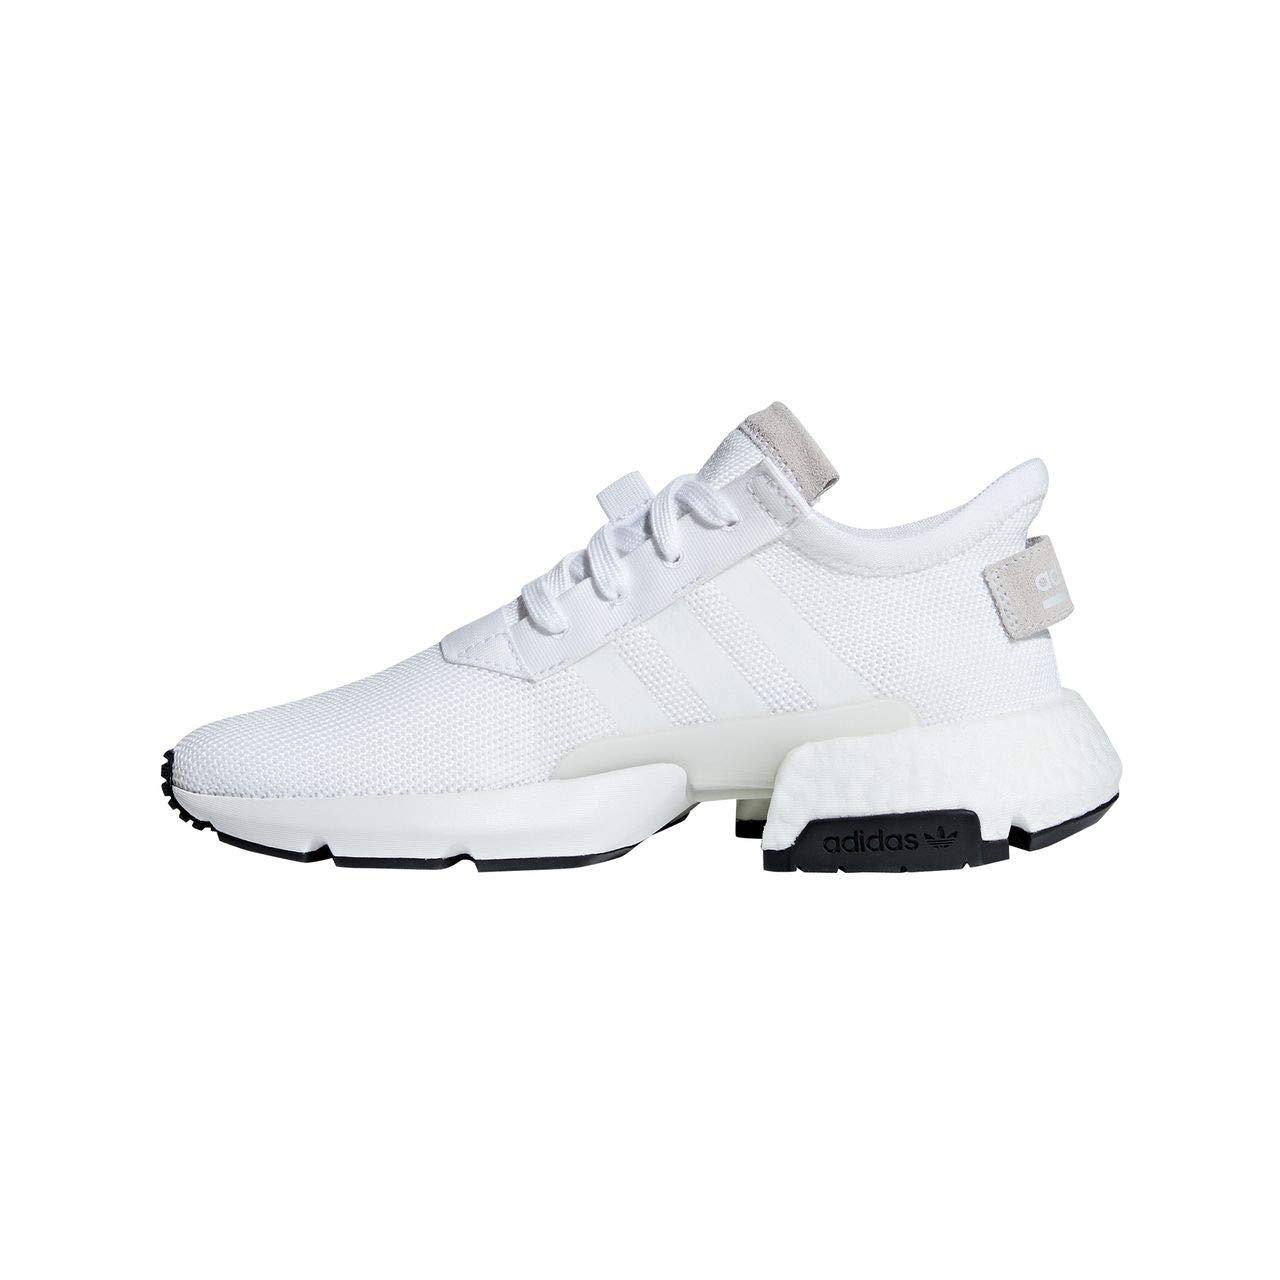 Blanc (Ftwr blanc Ftwr blanc Core noir) adidas Pod-s3.1 W, Chaussures de Gymnastique Femme 38 EU